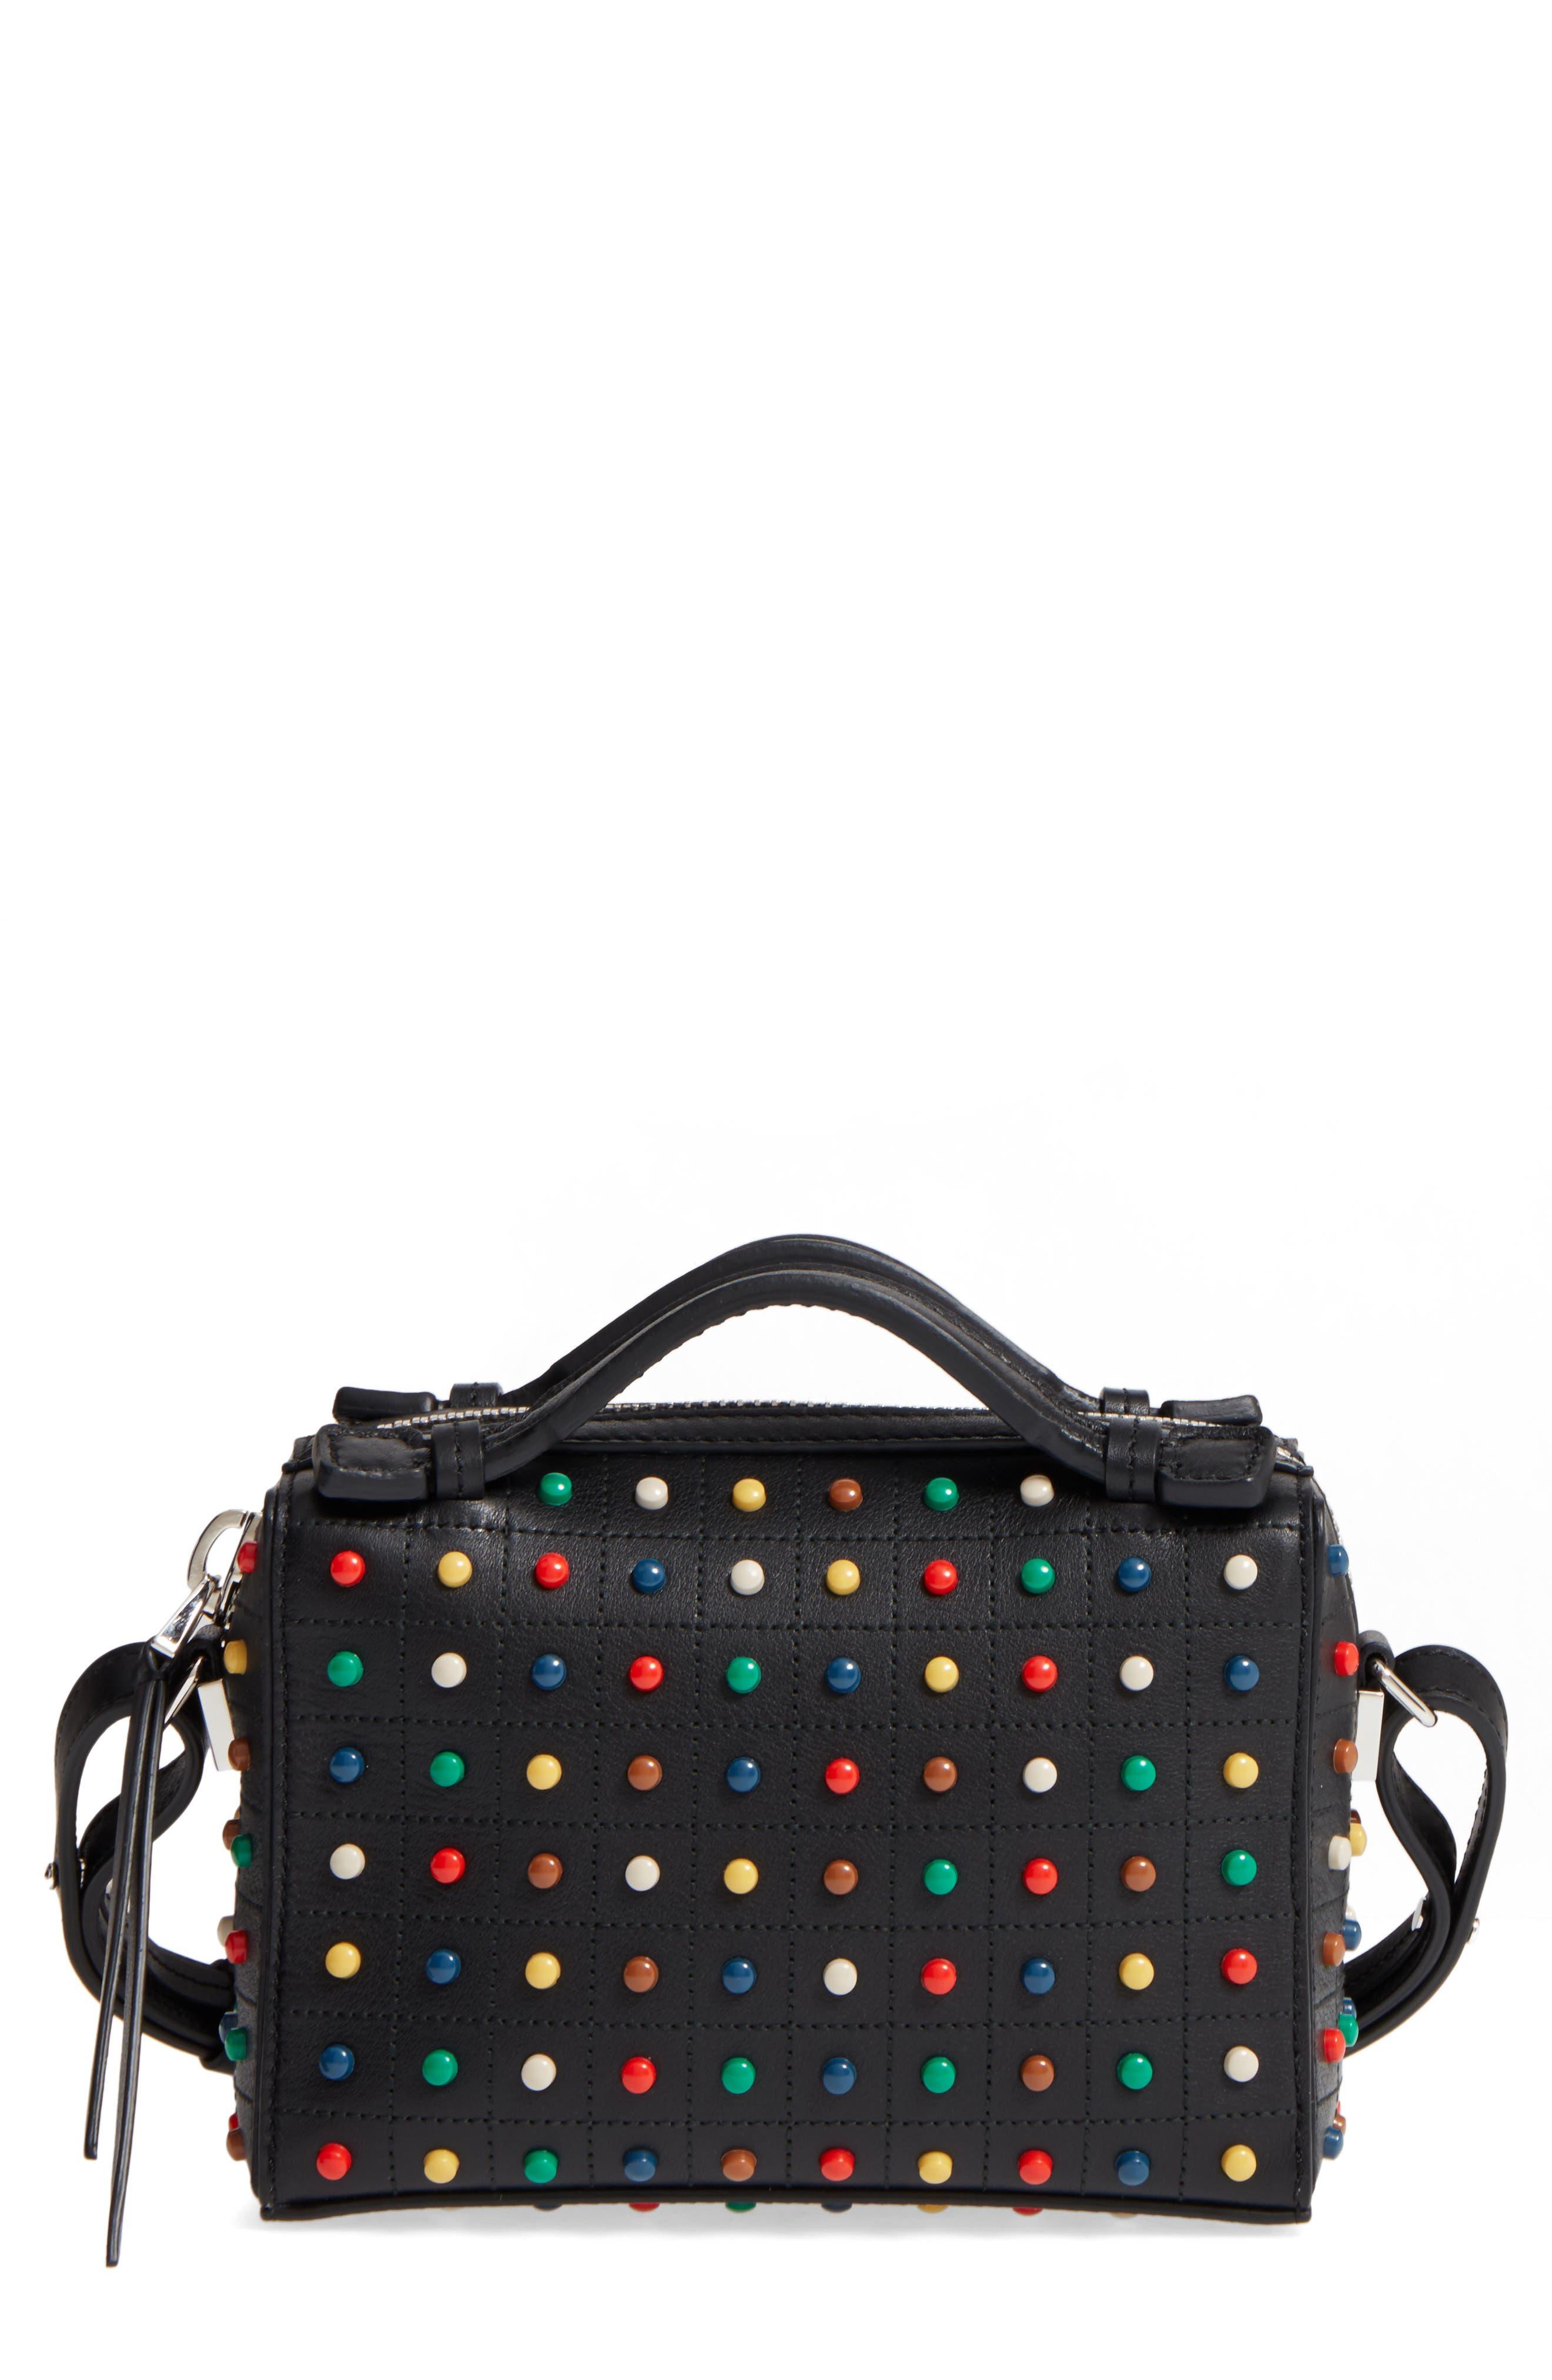 Main Image - Tod's Micro Diodon Rainbow Studded Leather Bowler Bag